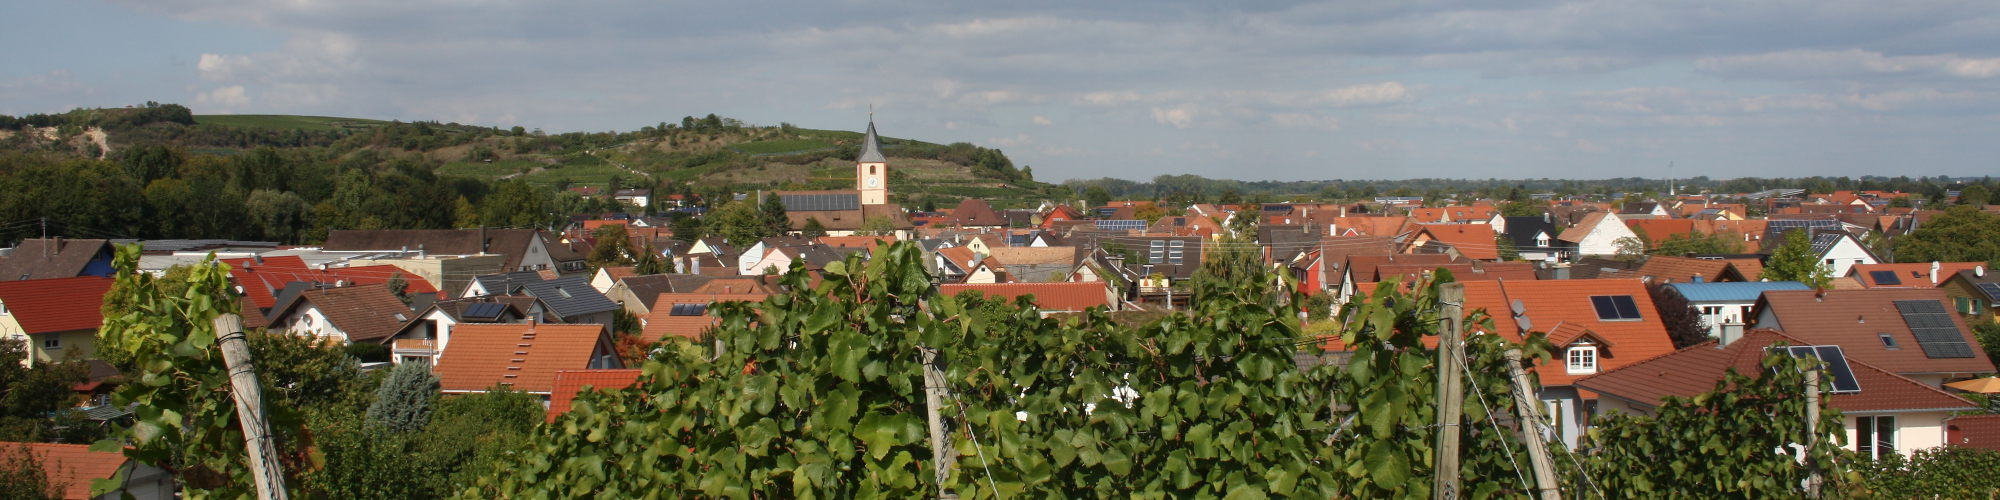 Sasbach mit dem Limberg